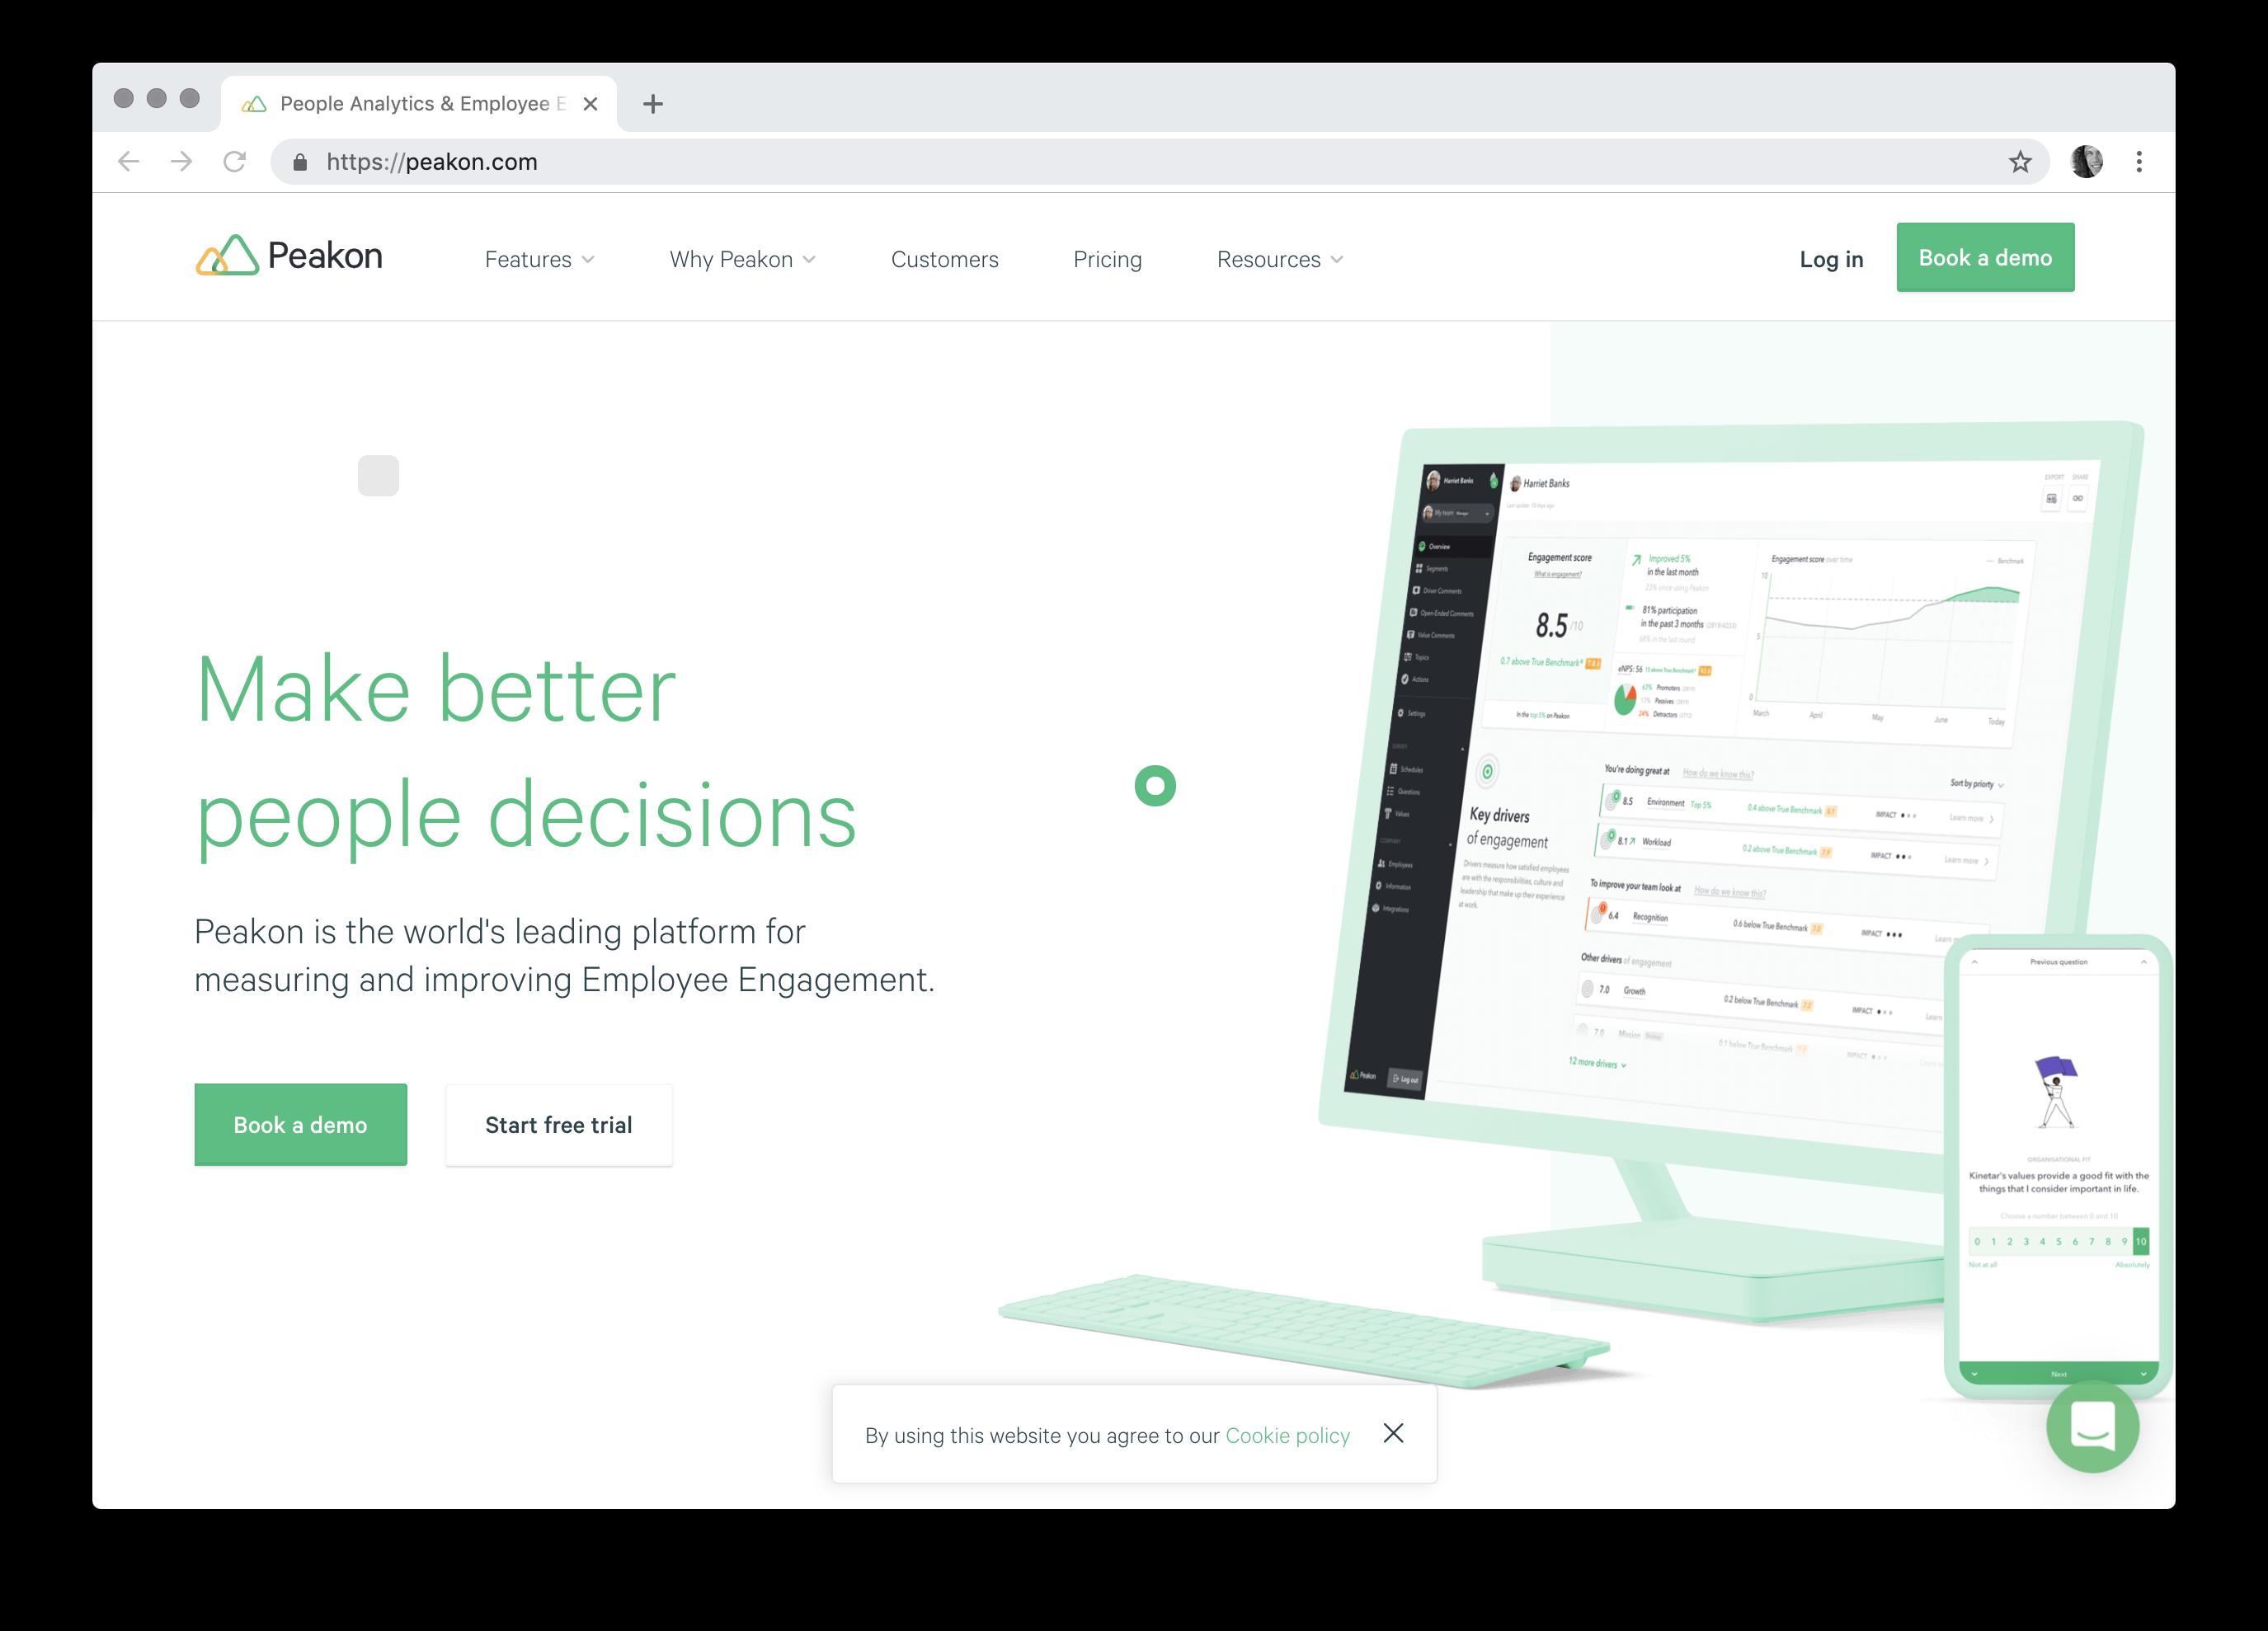 People Analytics & Employee Engagement Software - Peakon